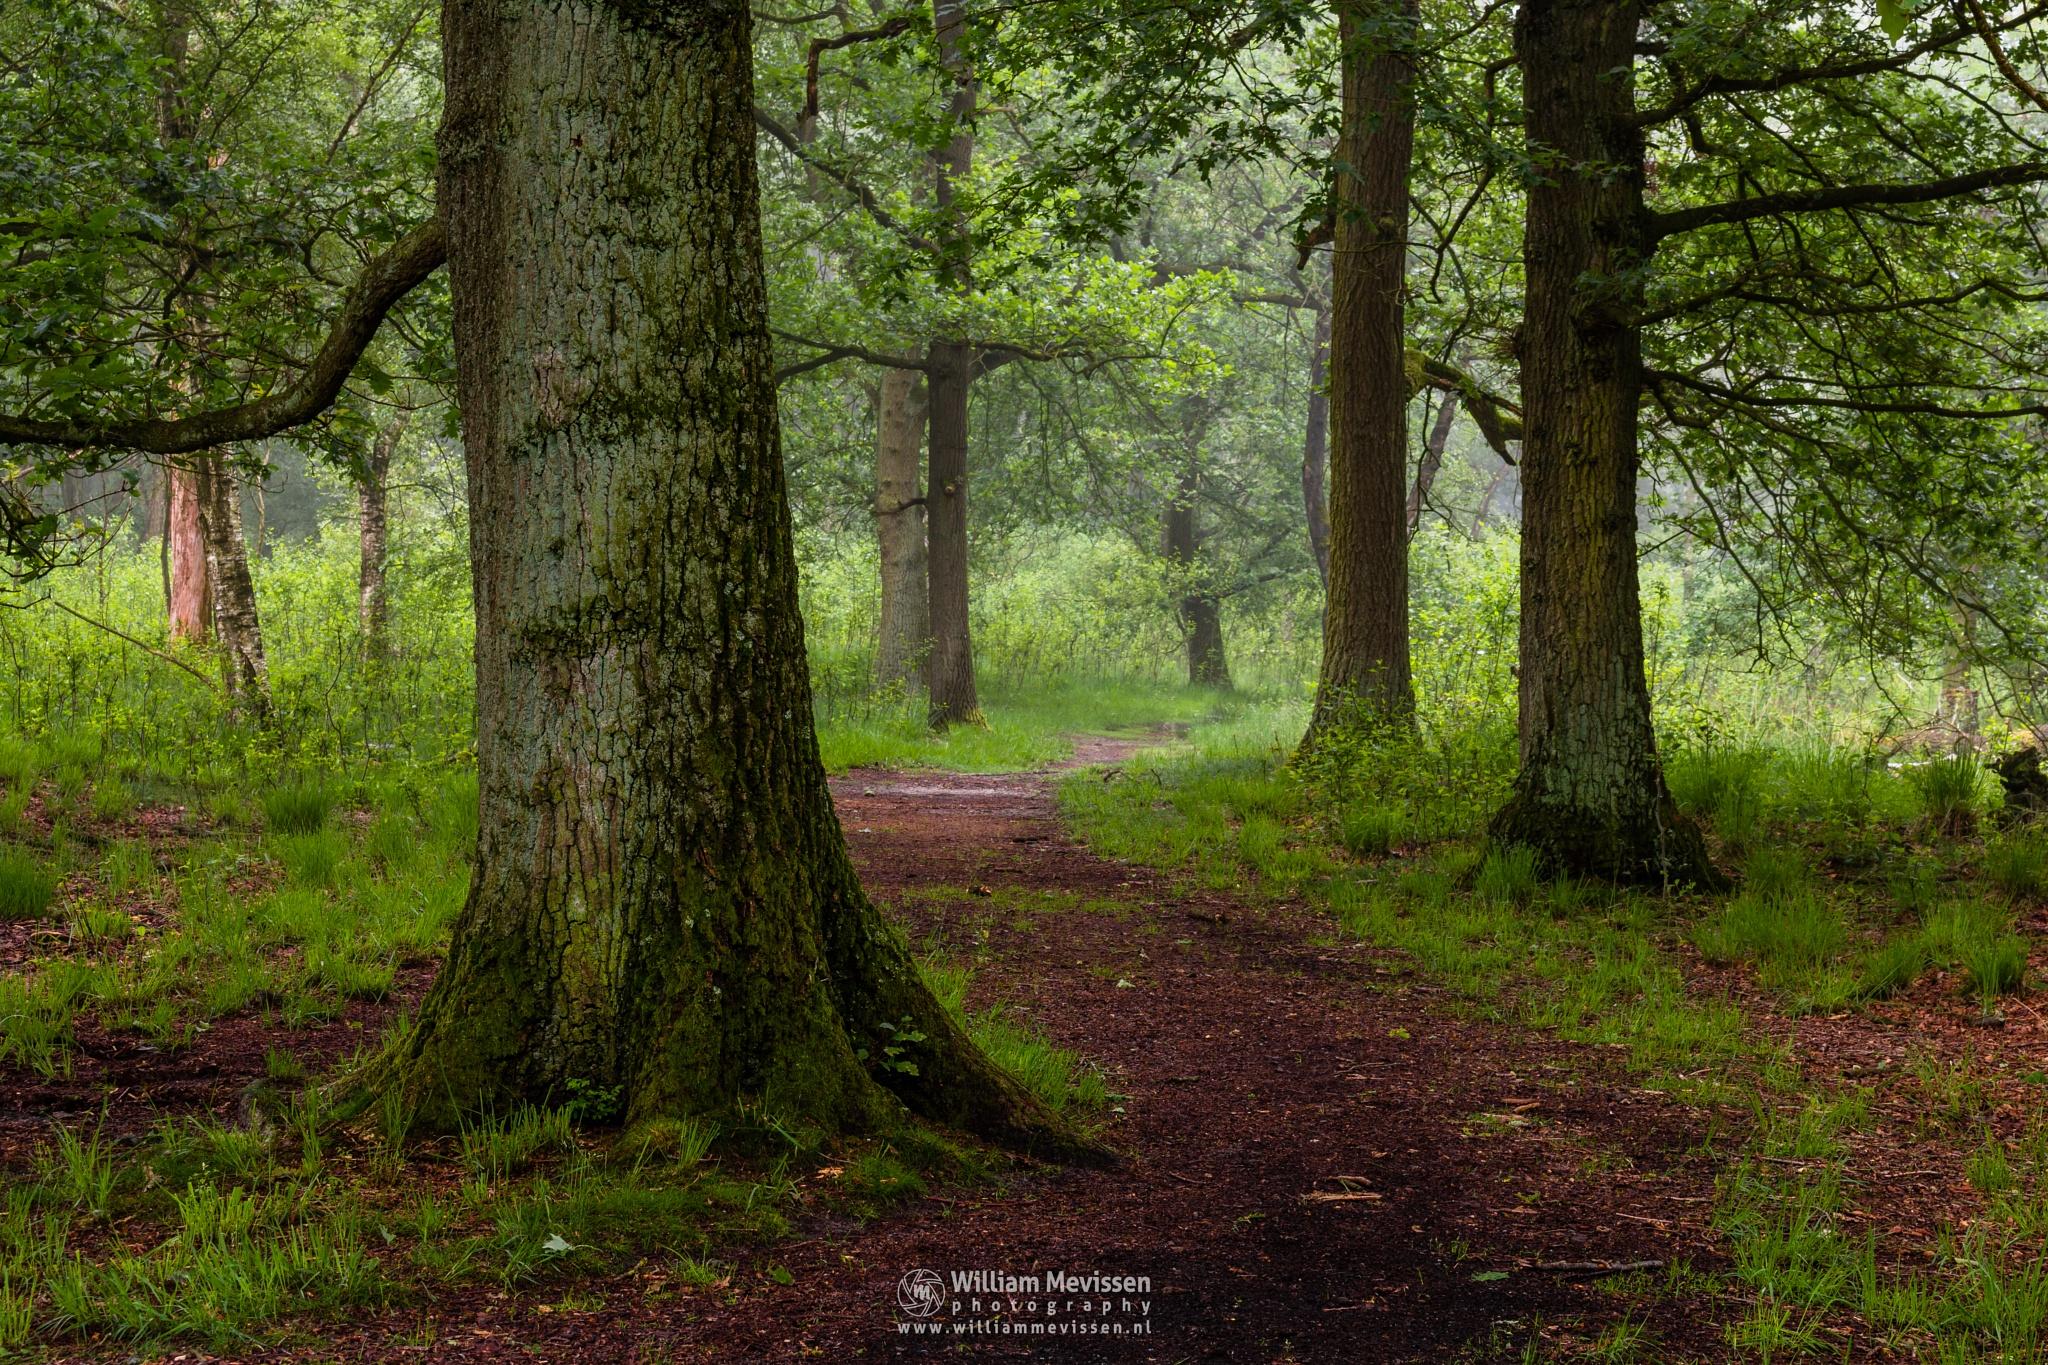 Tree Trunks by William Mevissen